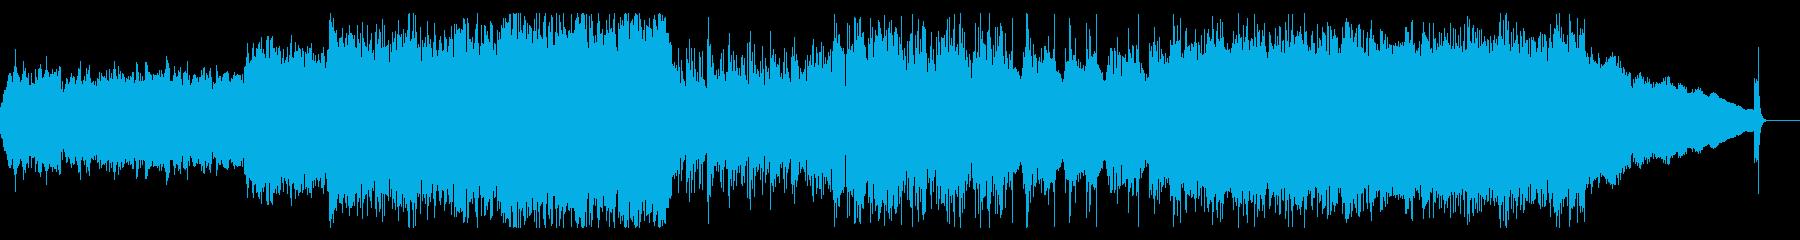 RPGのラスボス戦で流れるヘヴィメタルの再生済みの波形